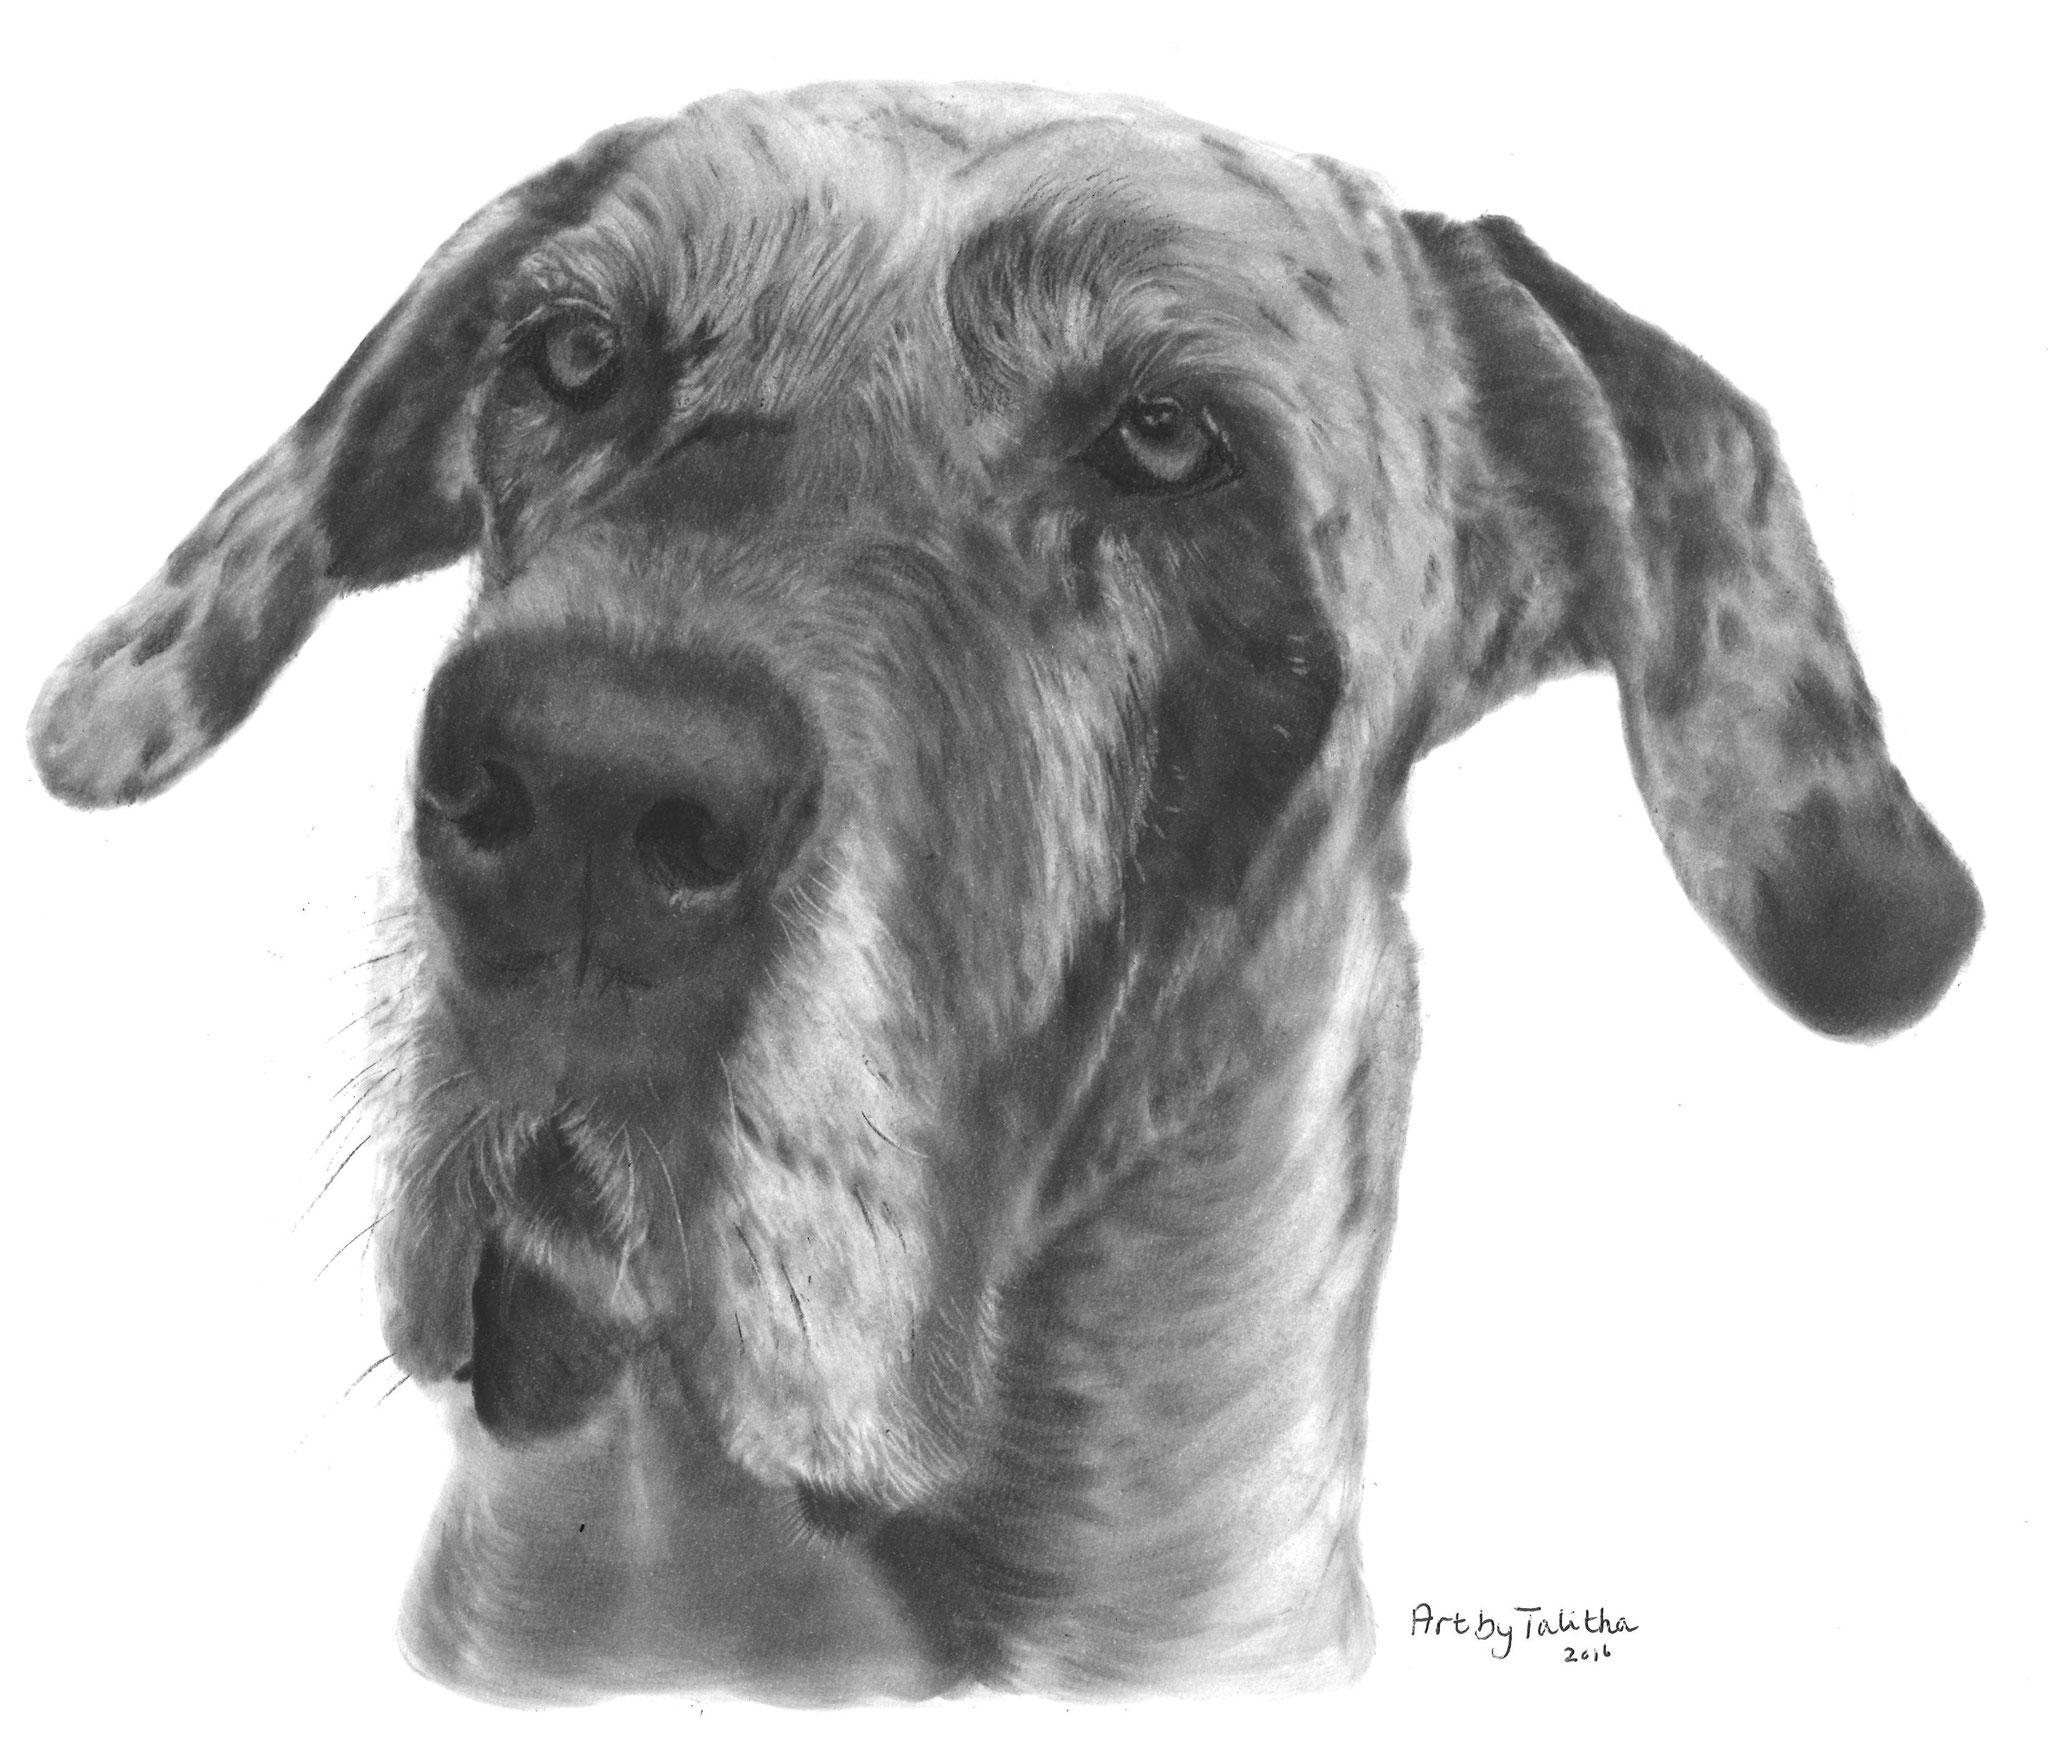 'Faya de Duitse Dog'